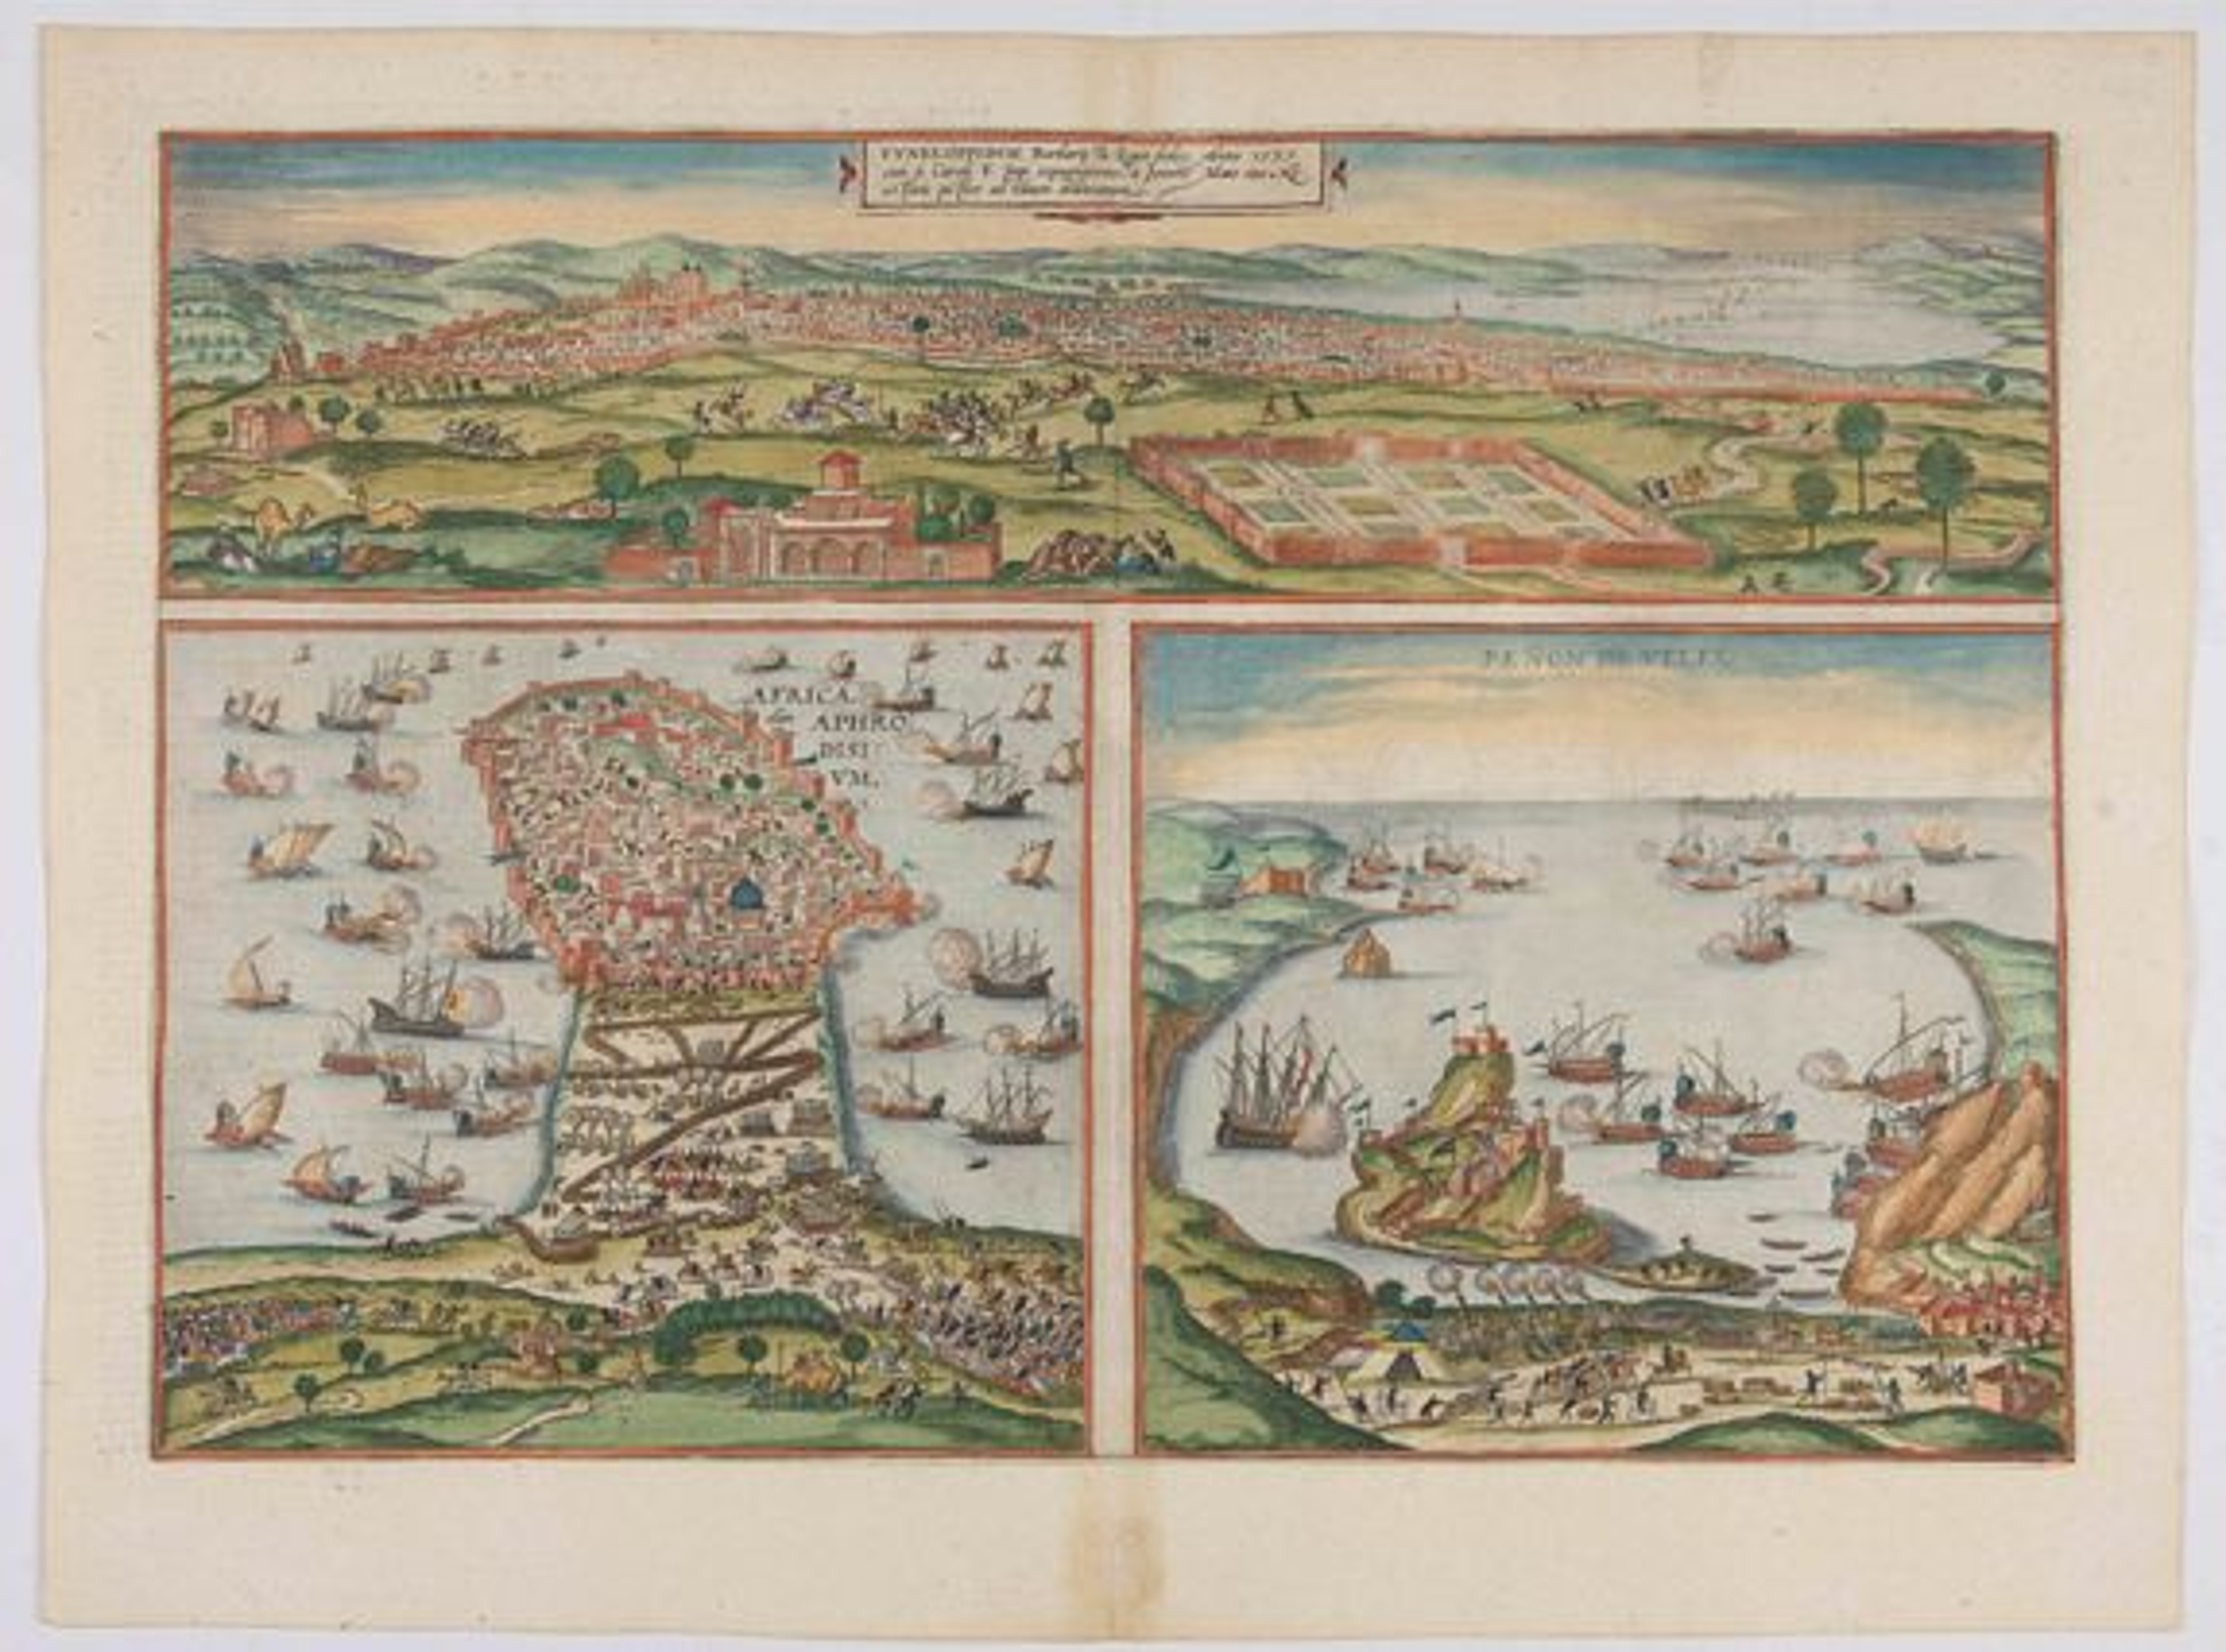 BRAUN, G. / HOGENBERG, F. -  Tunes, Oppidum Barbarie &, Regia Sedes... [on sheet with] Africa, olim Aphrodisium [and] Penon de Veles.